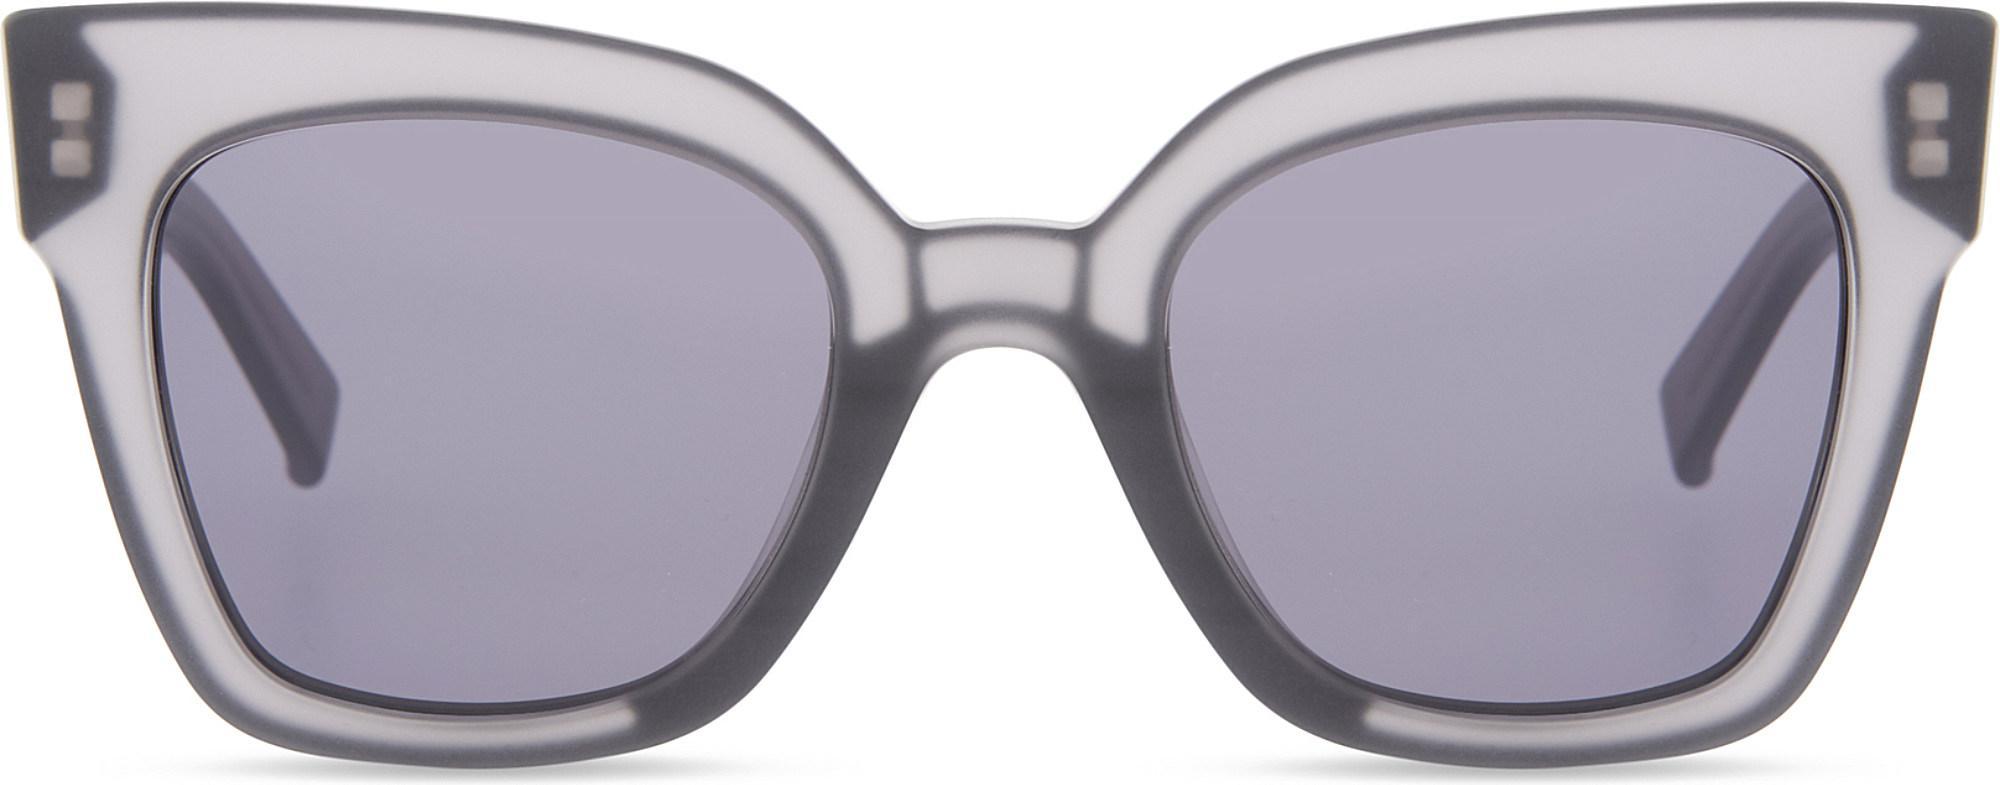 021872ba4b Lyst - Max Mara Prism Iv Square-frame Sunglasses in Gray